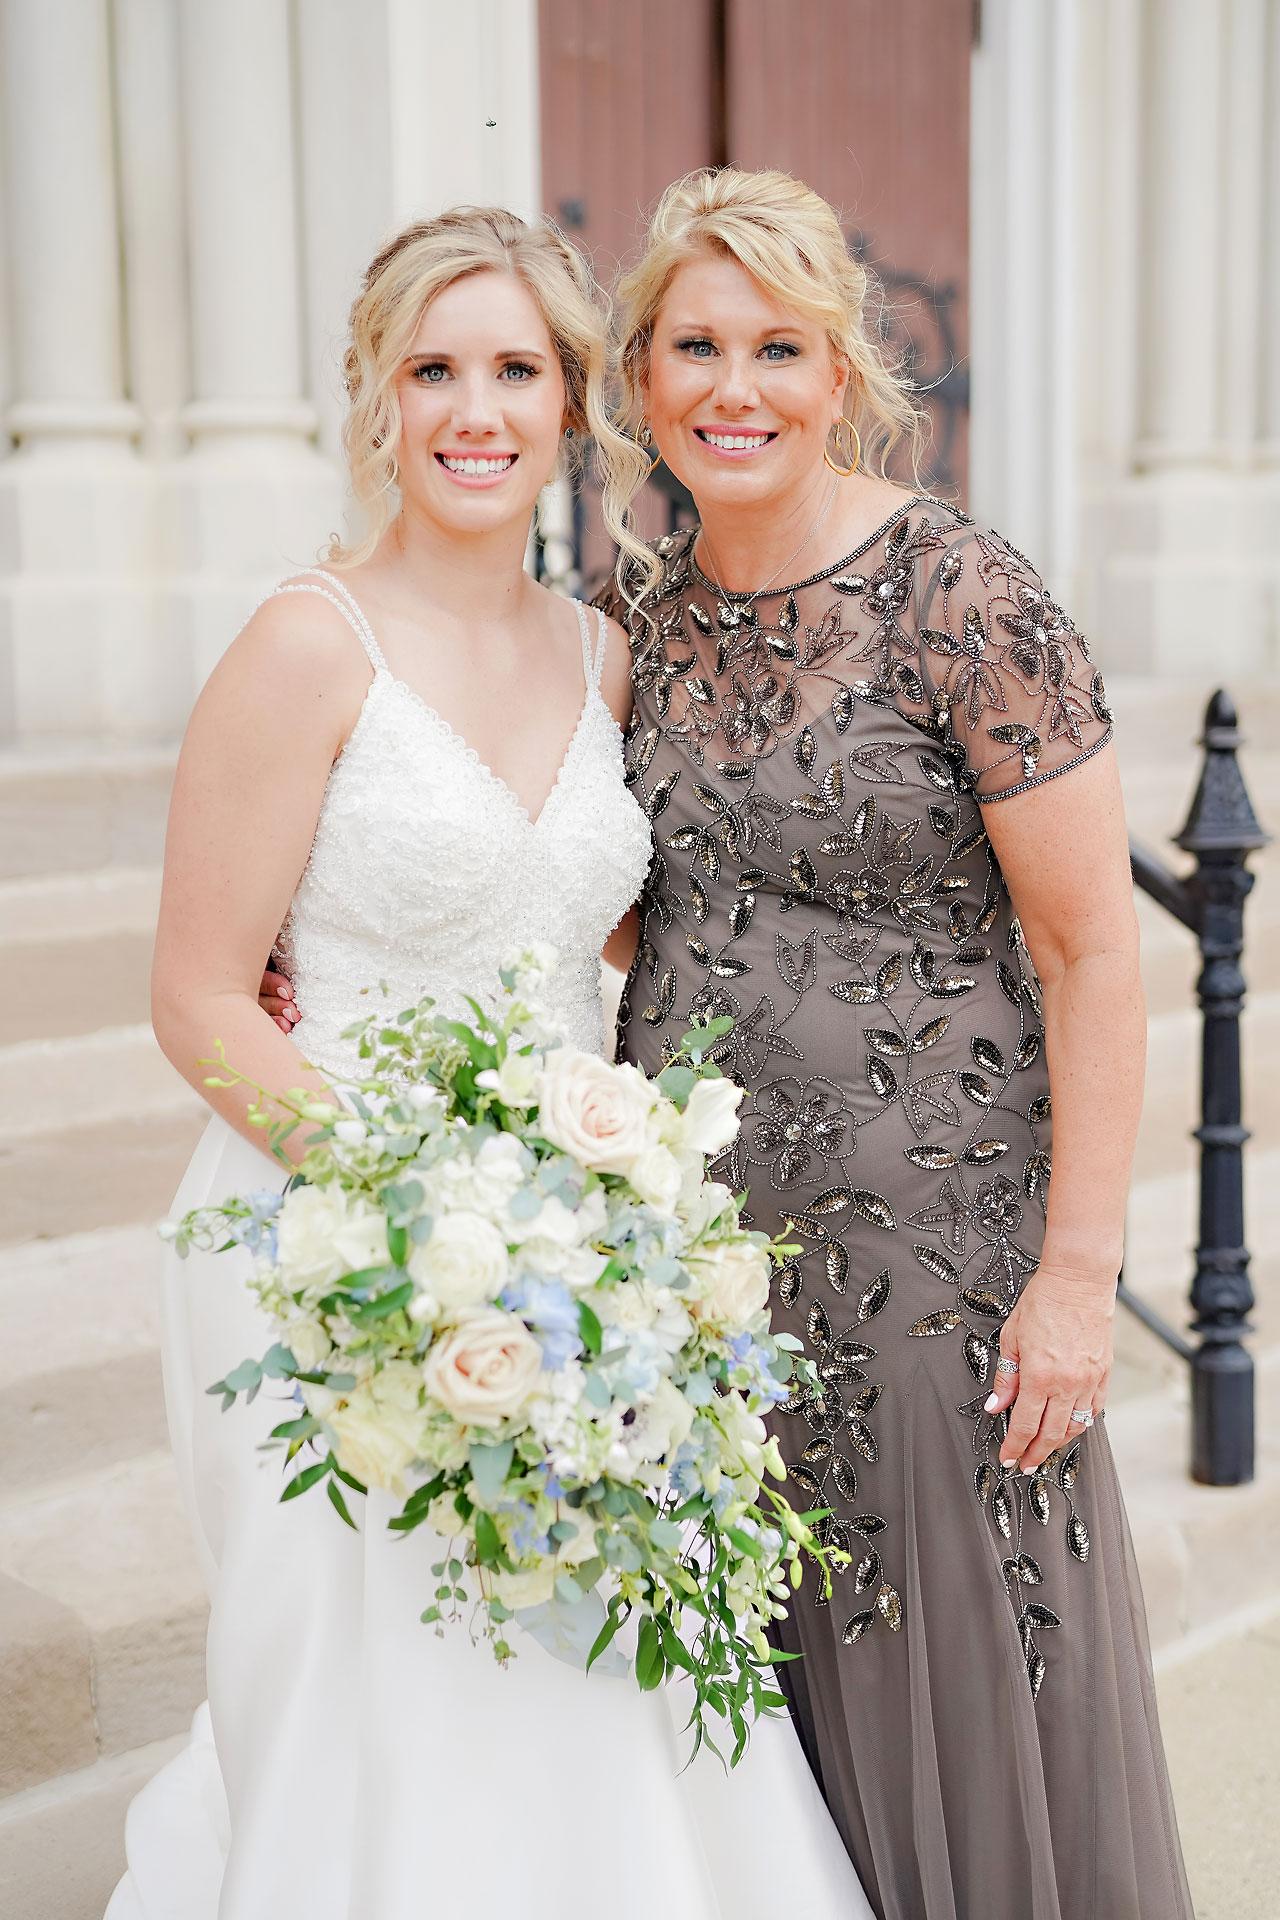 Sammi Jack Regions Tower JPS Events Indianapolis Wedding 156